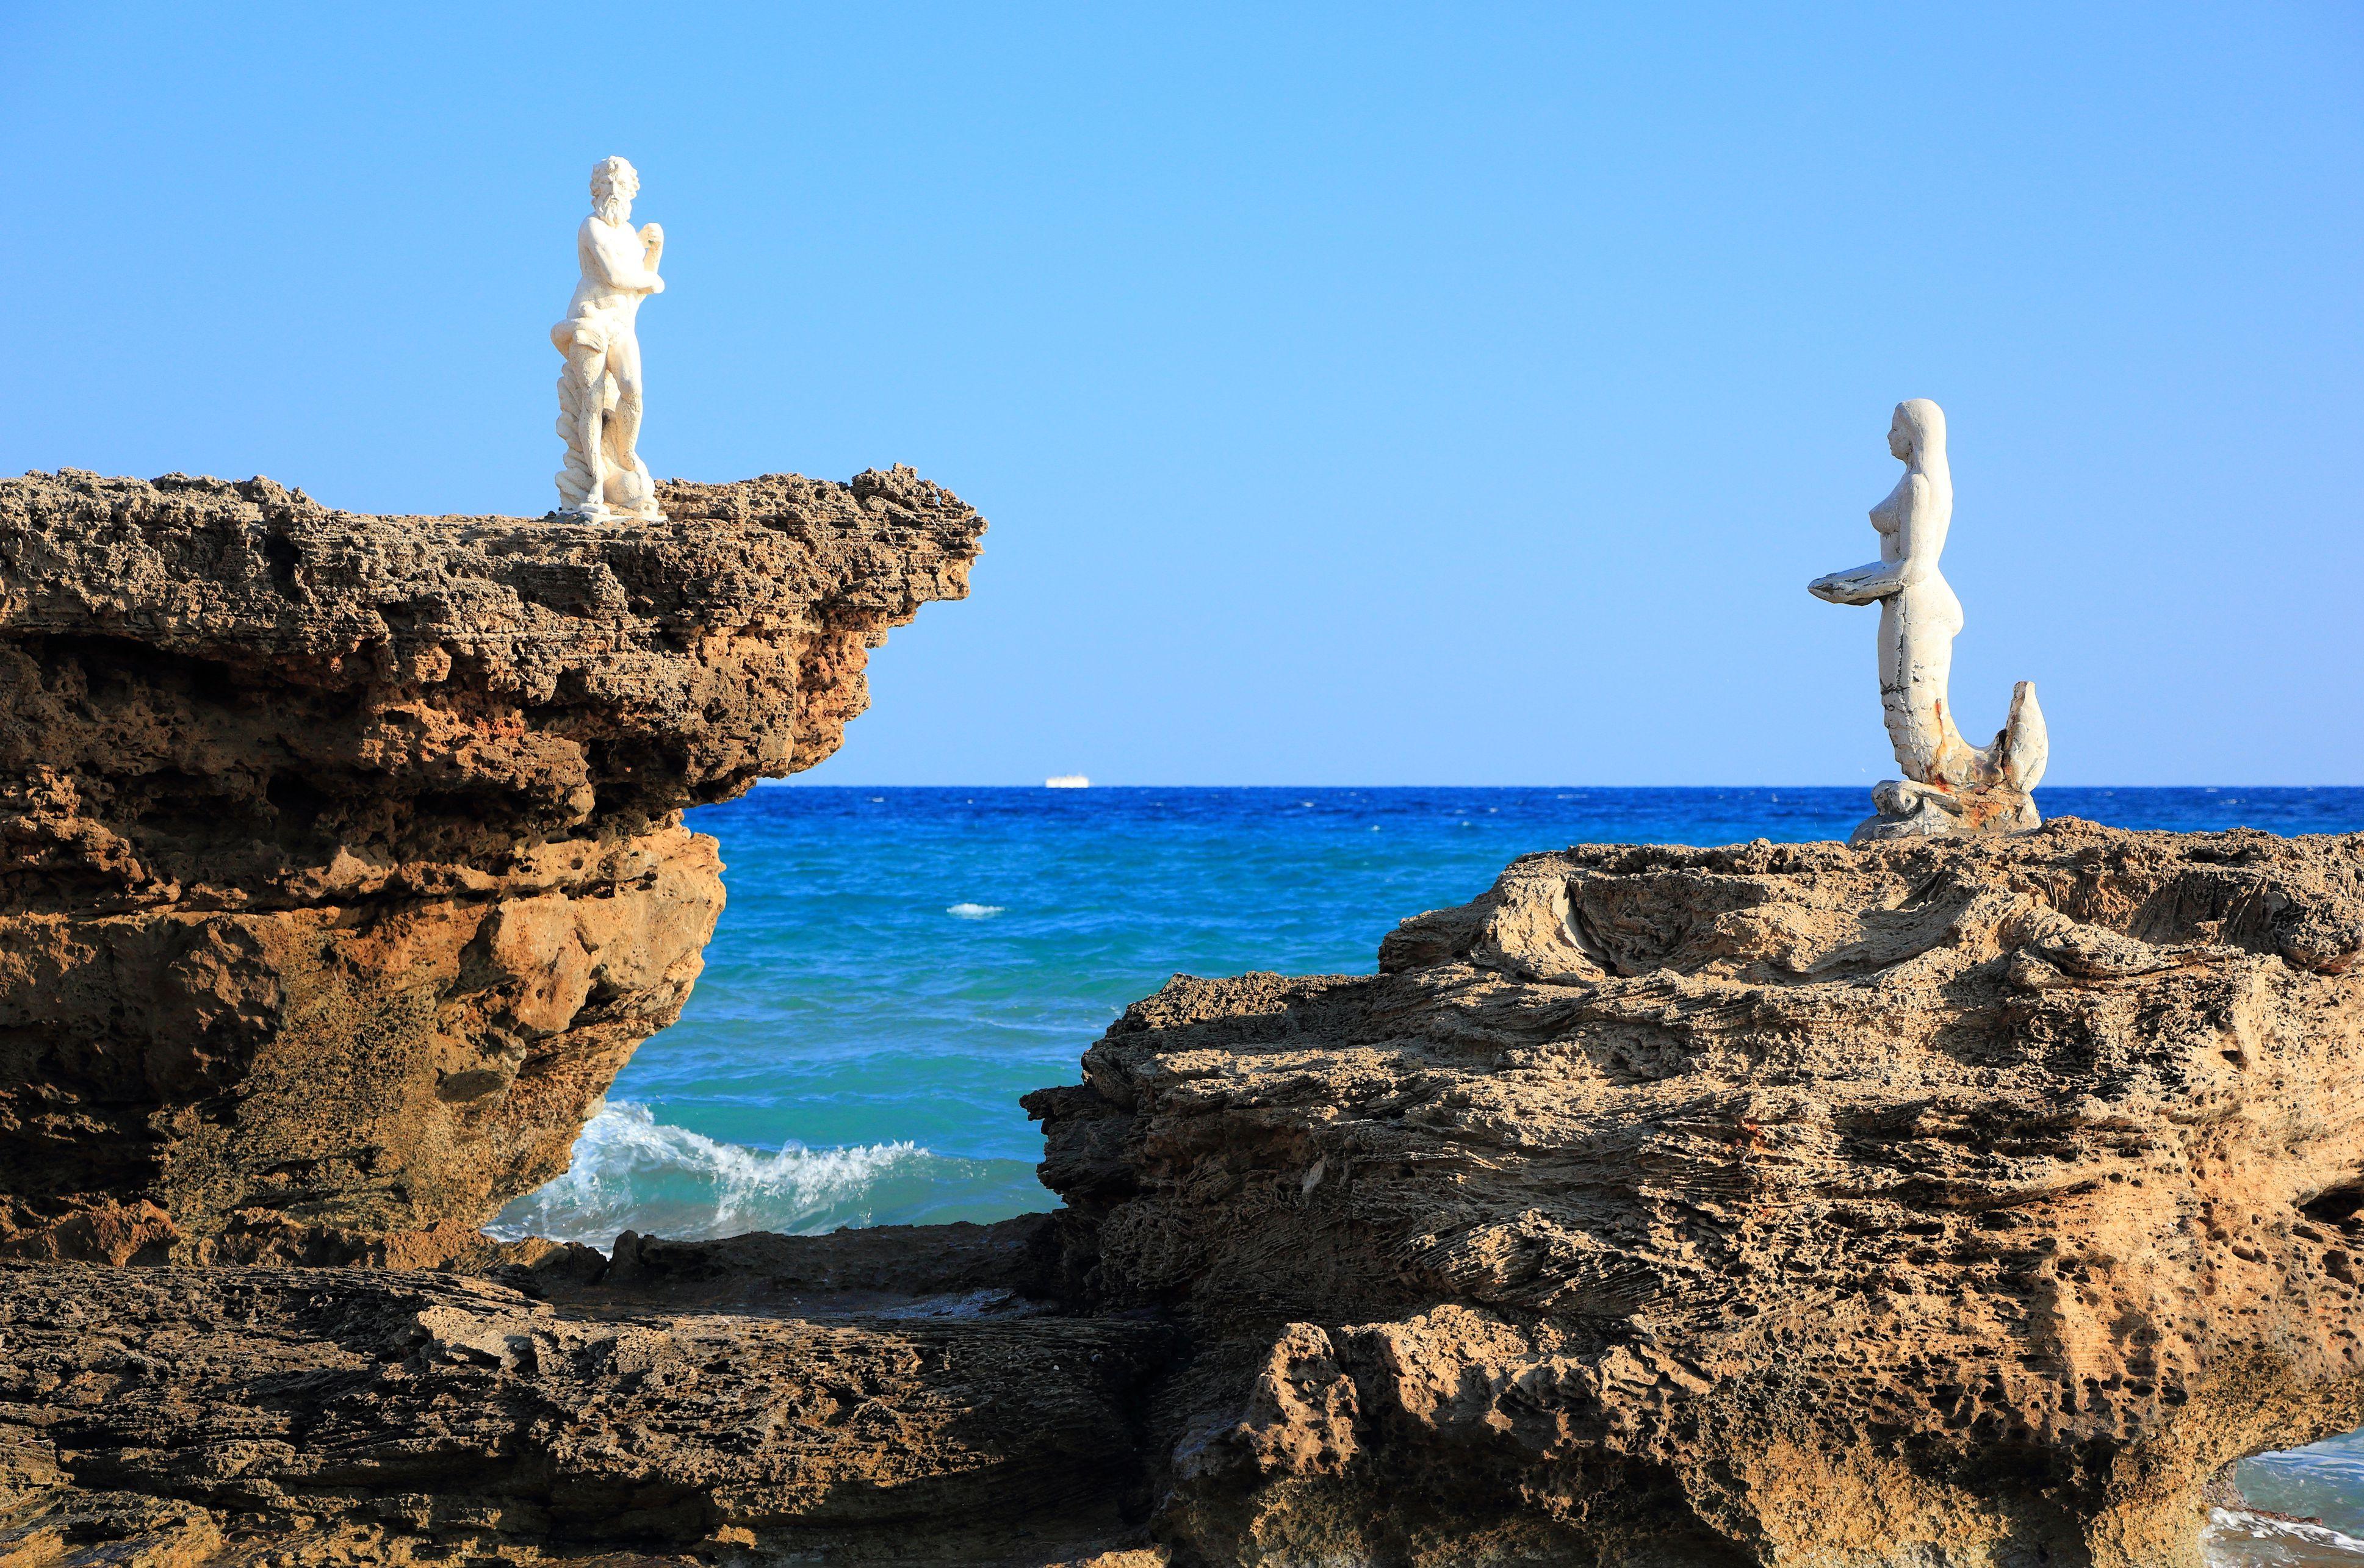 Poseidon and Mermaid. North-East coast of Zakynthos or Zante island, Ionian Sea, Greece.